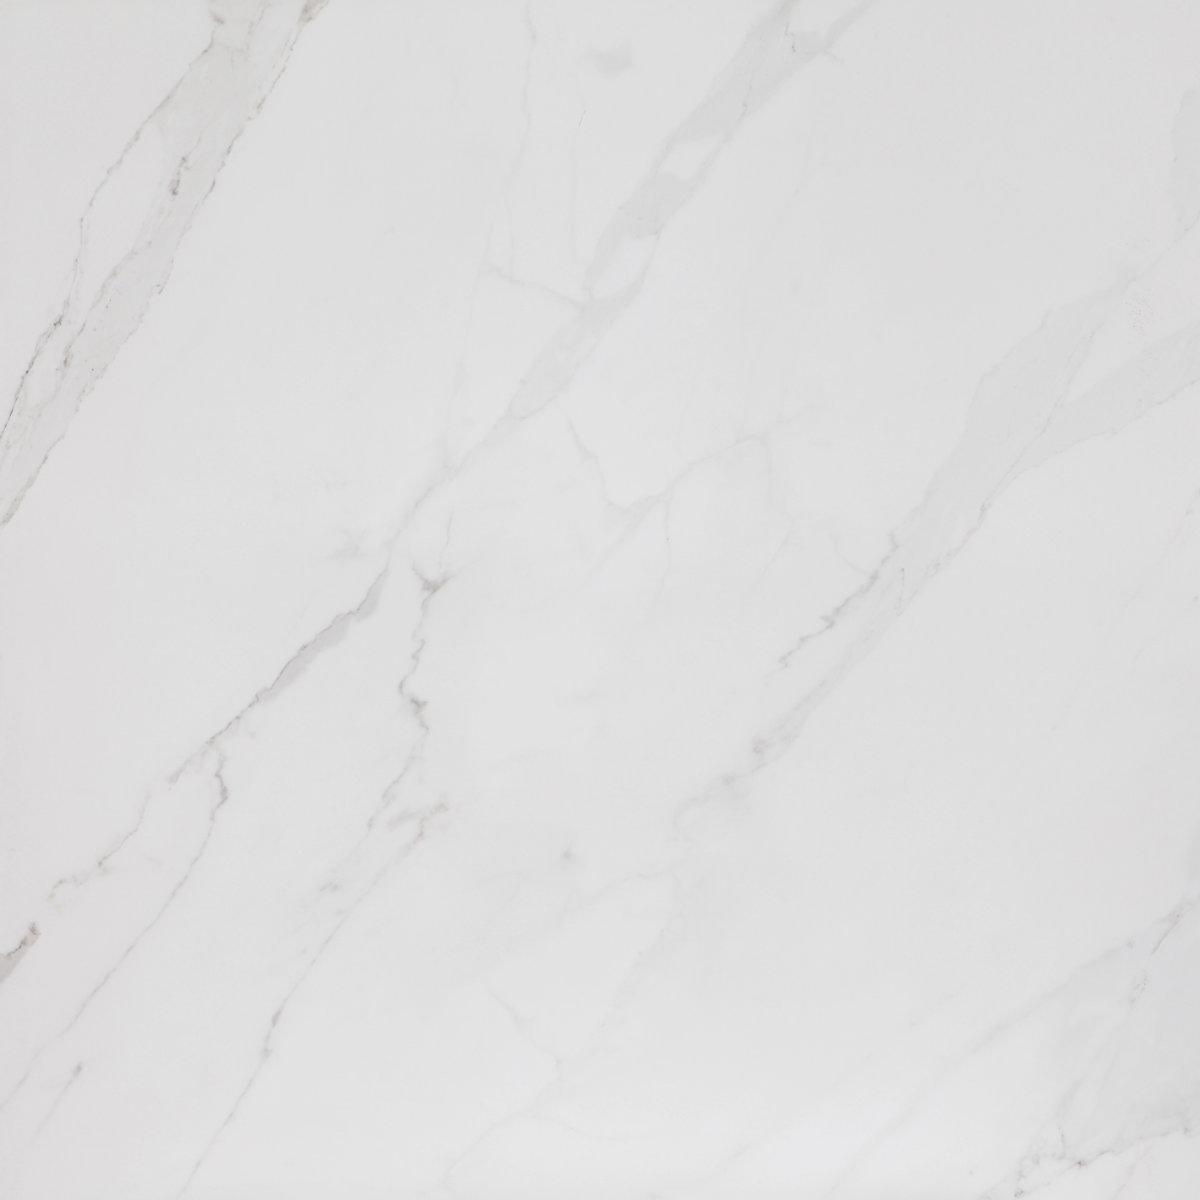 Eli Mont Blanc AC 900x900mm_Stiles_Product6_Image